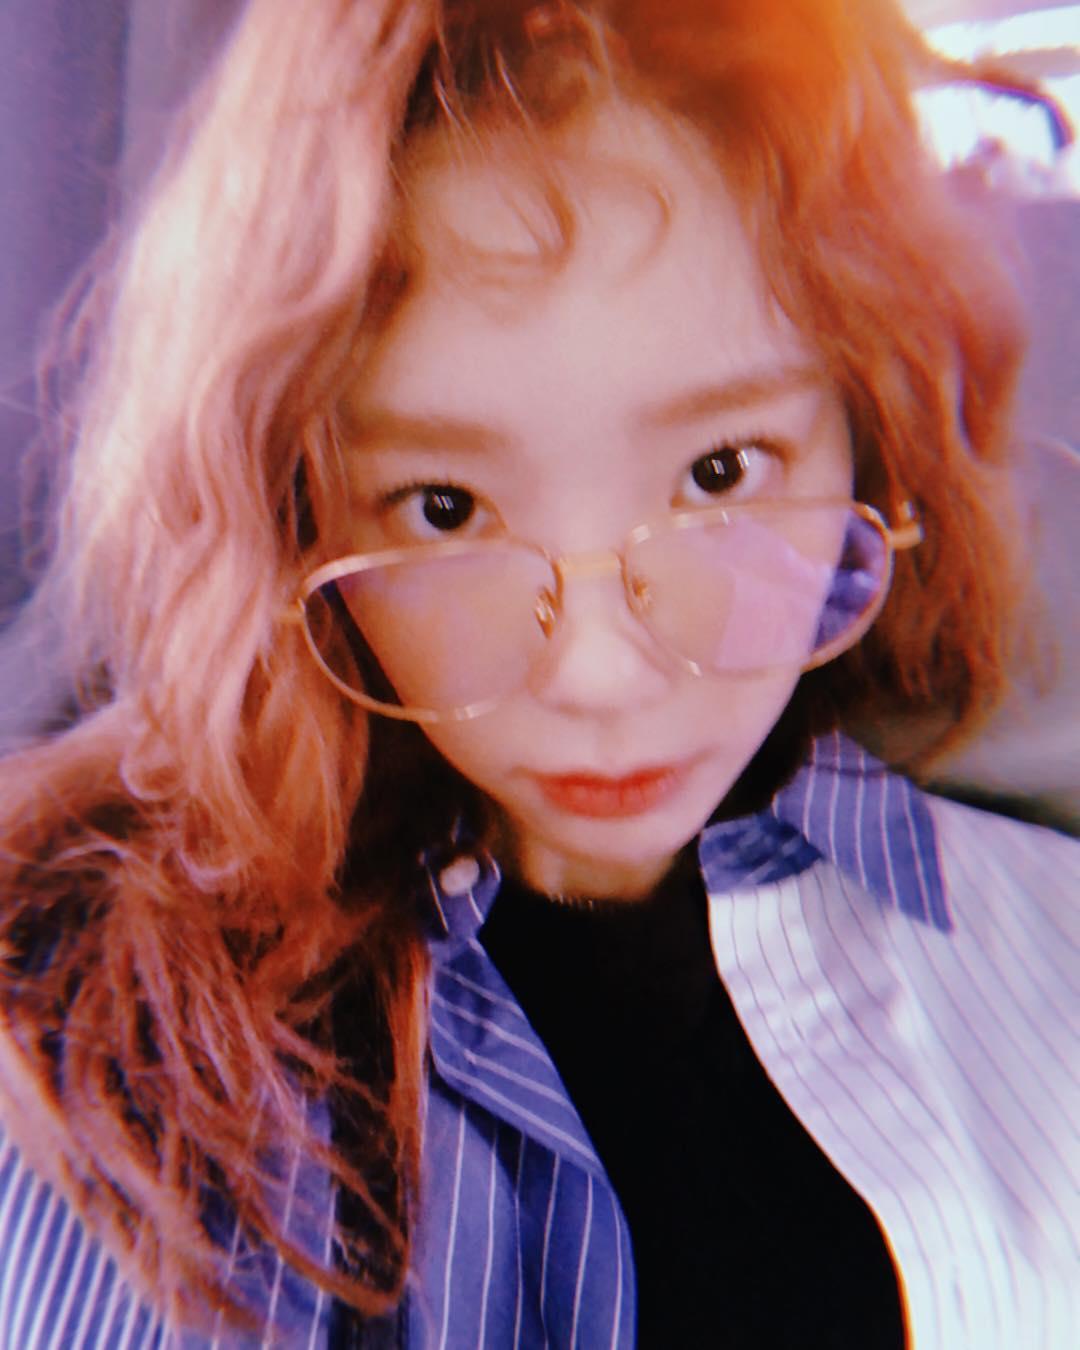 NO.8 少女時代 太妍 追蹤人數:12.8m  在少女時代裡擔任隊長和主唱,出道前太妍受到同公司前輩BoA影響,一直期許自己能成為像BoA這樣的全方位歌手,在多年的努力之下歌唱實力受到許多大咖肯定,JYP朴軫永曾把太妍選為「最想幫她製作專輯的歌手」是SM裡出名的實力派偶像歌手,每每solo都能創造話題和獲得好成績。